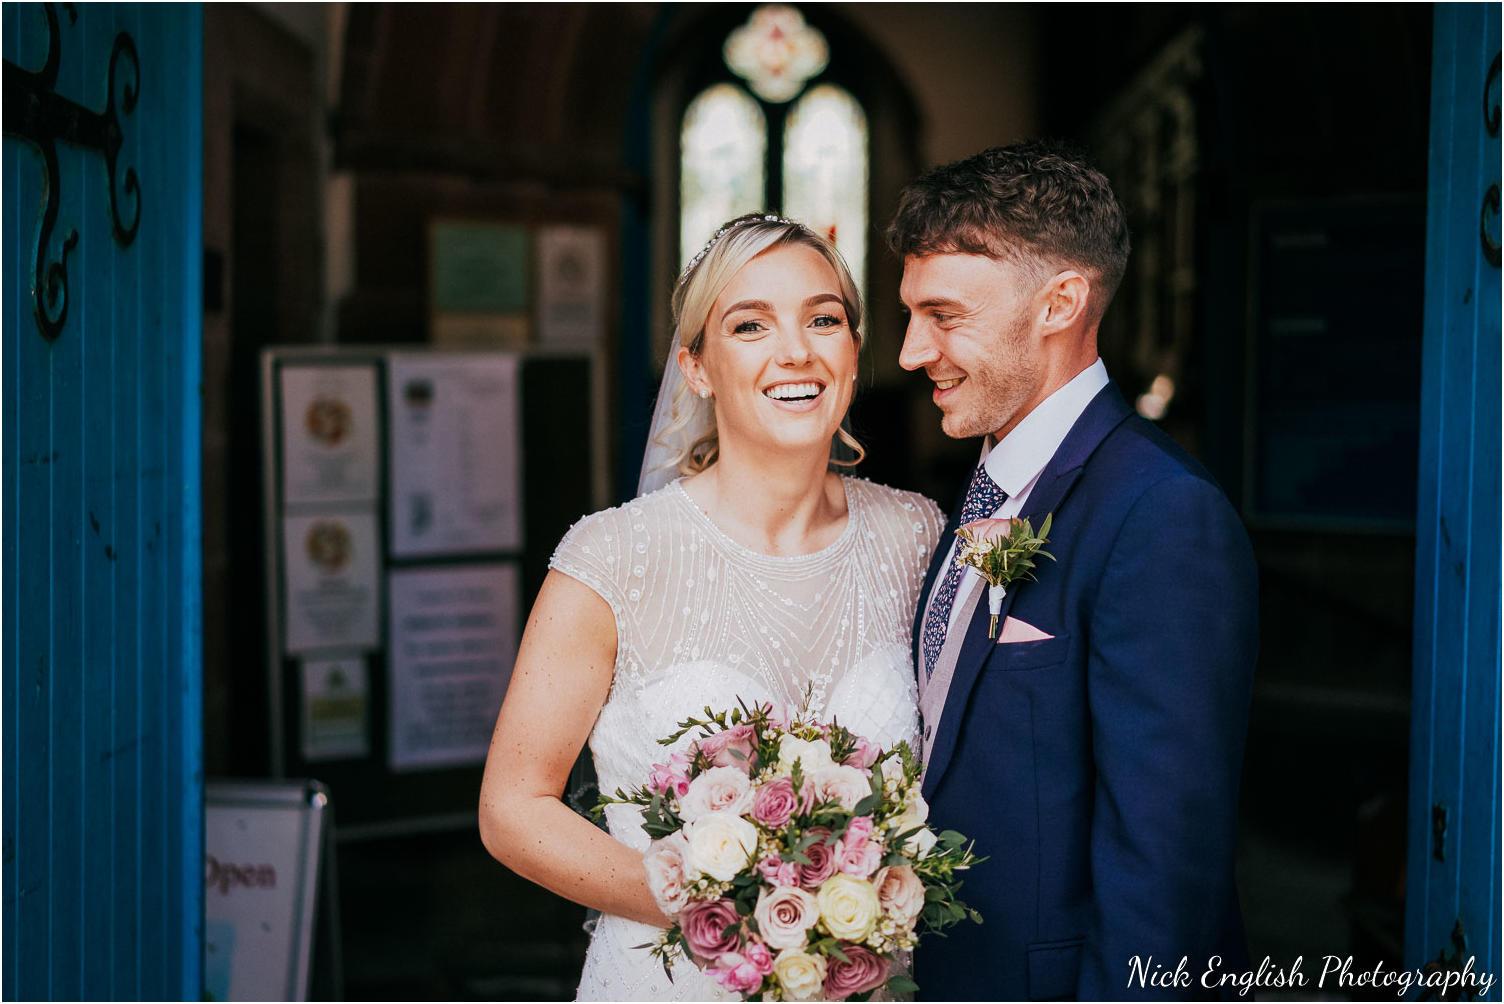 Mitton_Hall_Wedding_Photograph-50.jpg